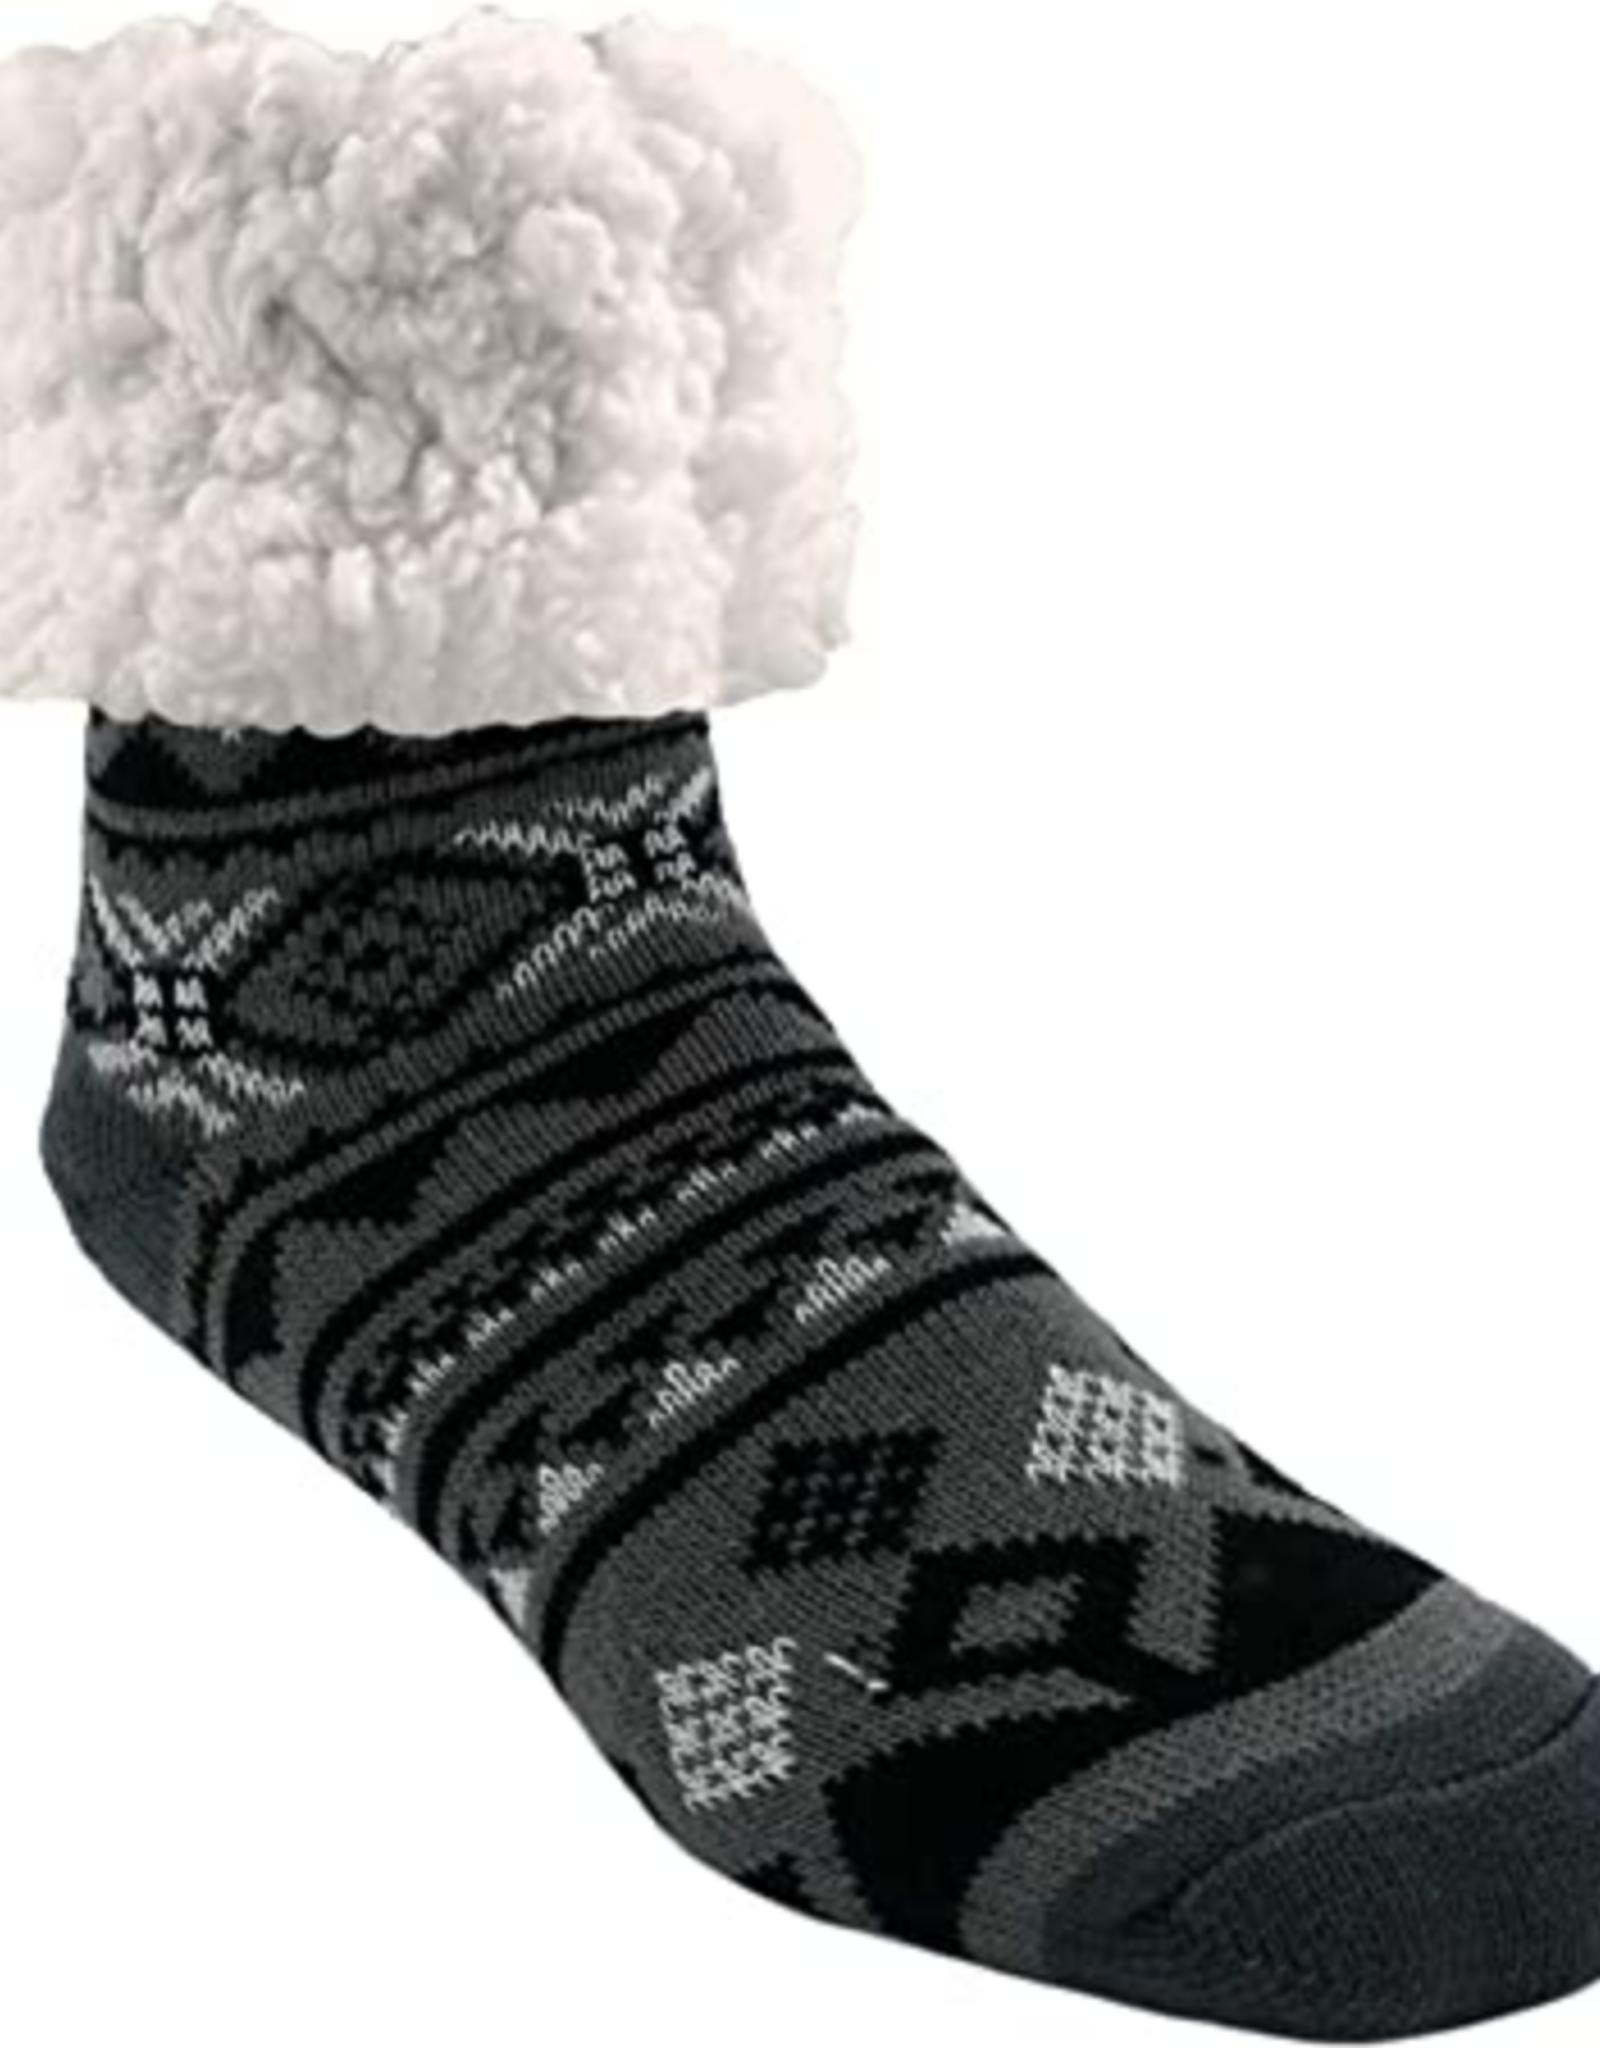 Pudus - Classic Slipper Sock